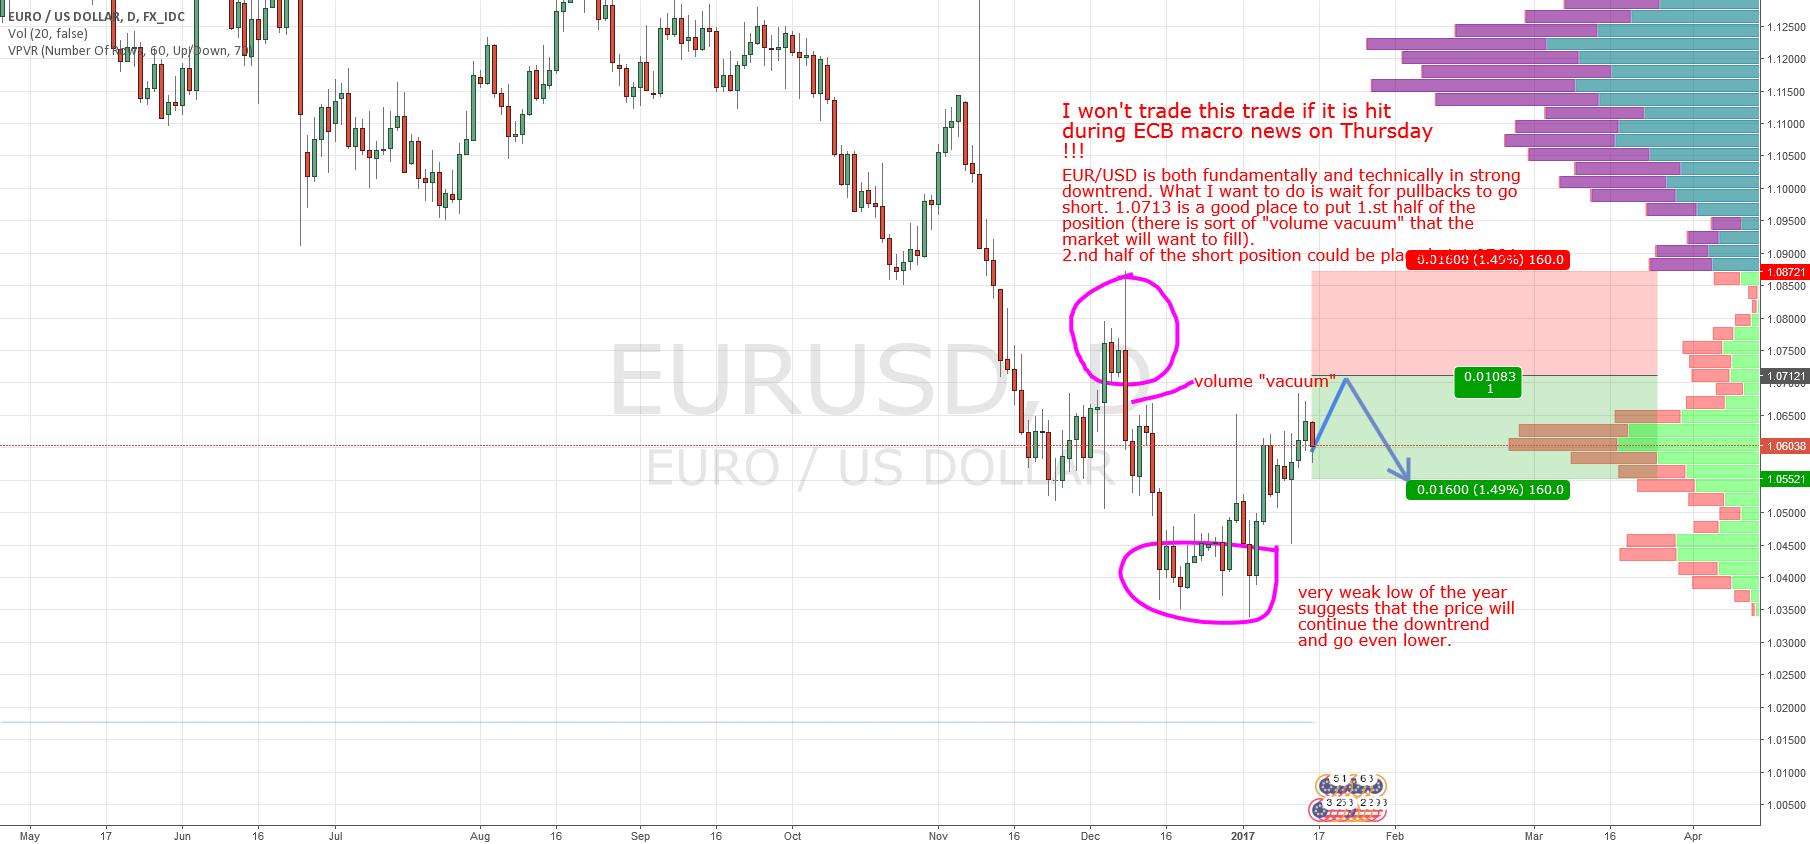 Option trading bear market strategies dubai